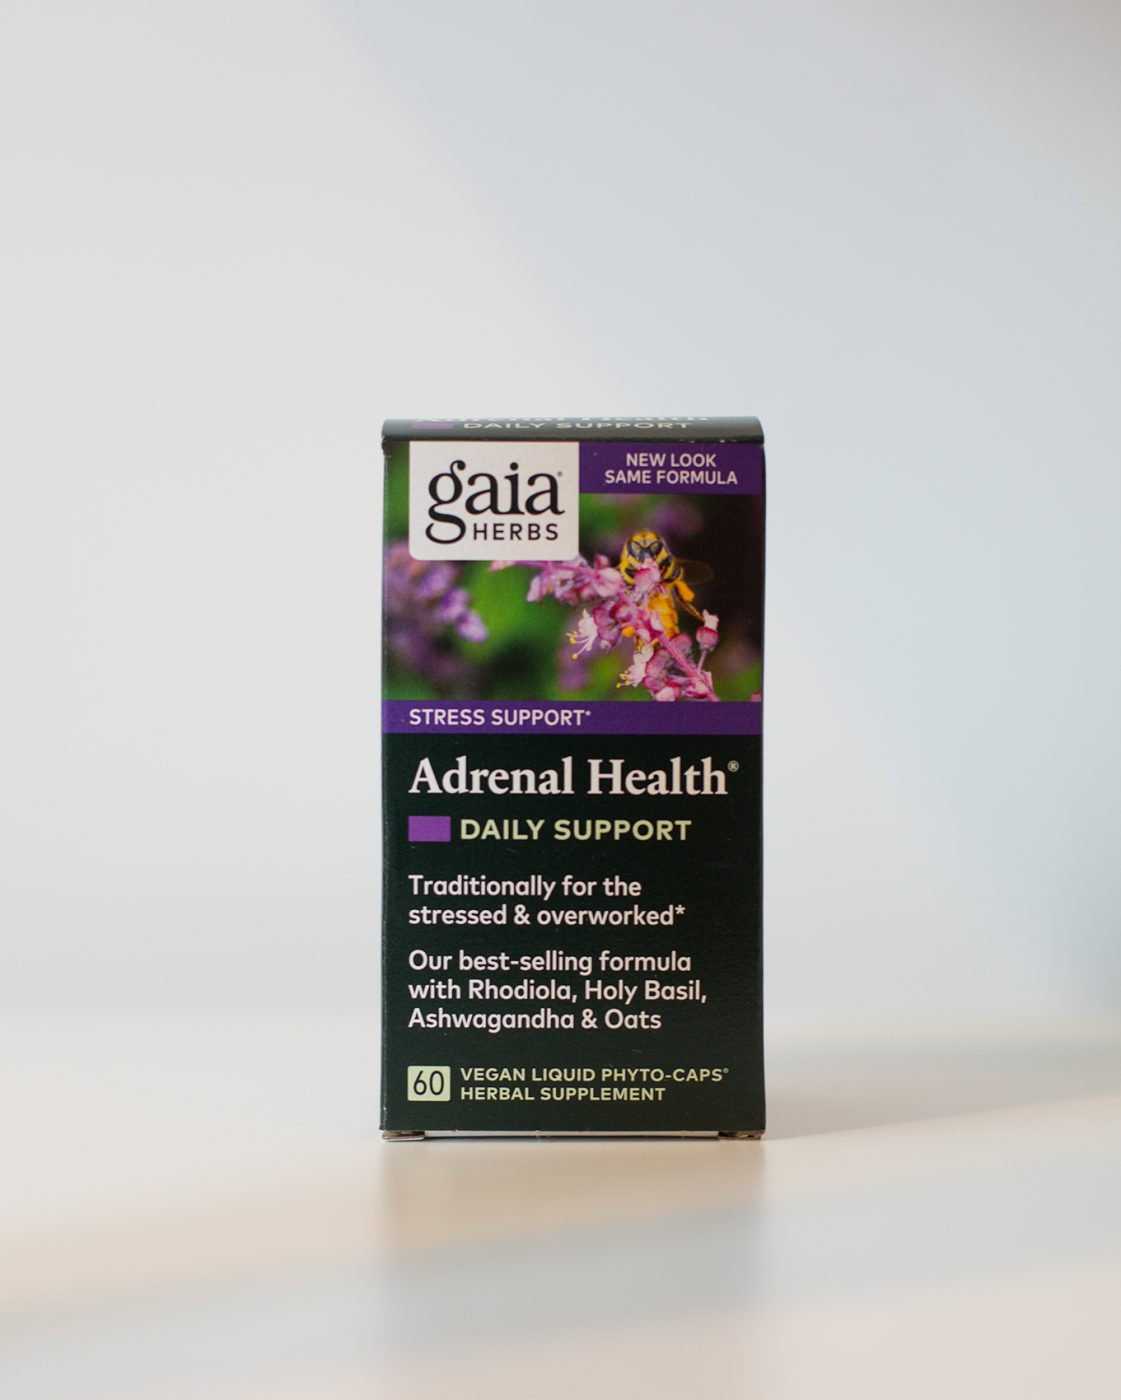 Adrenal Health Supplement Box